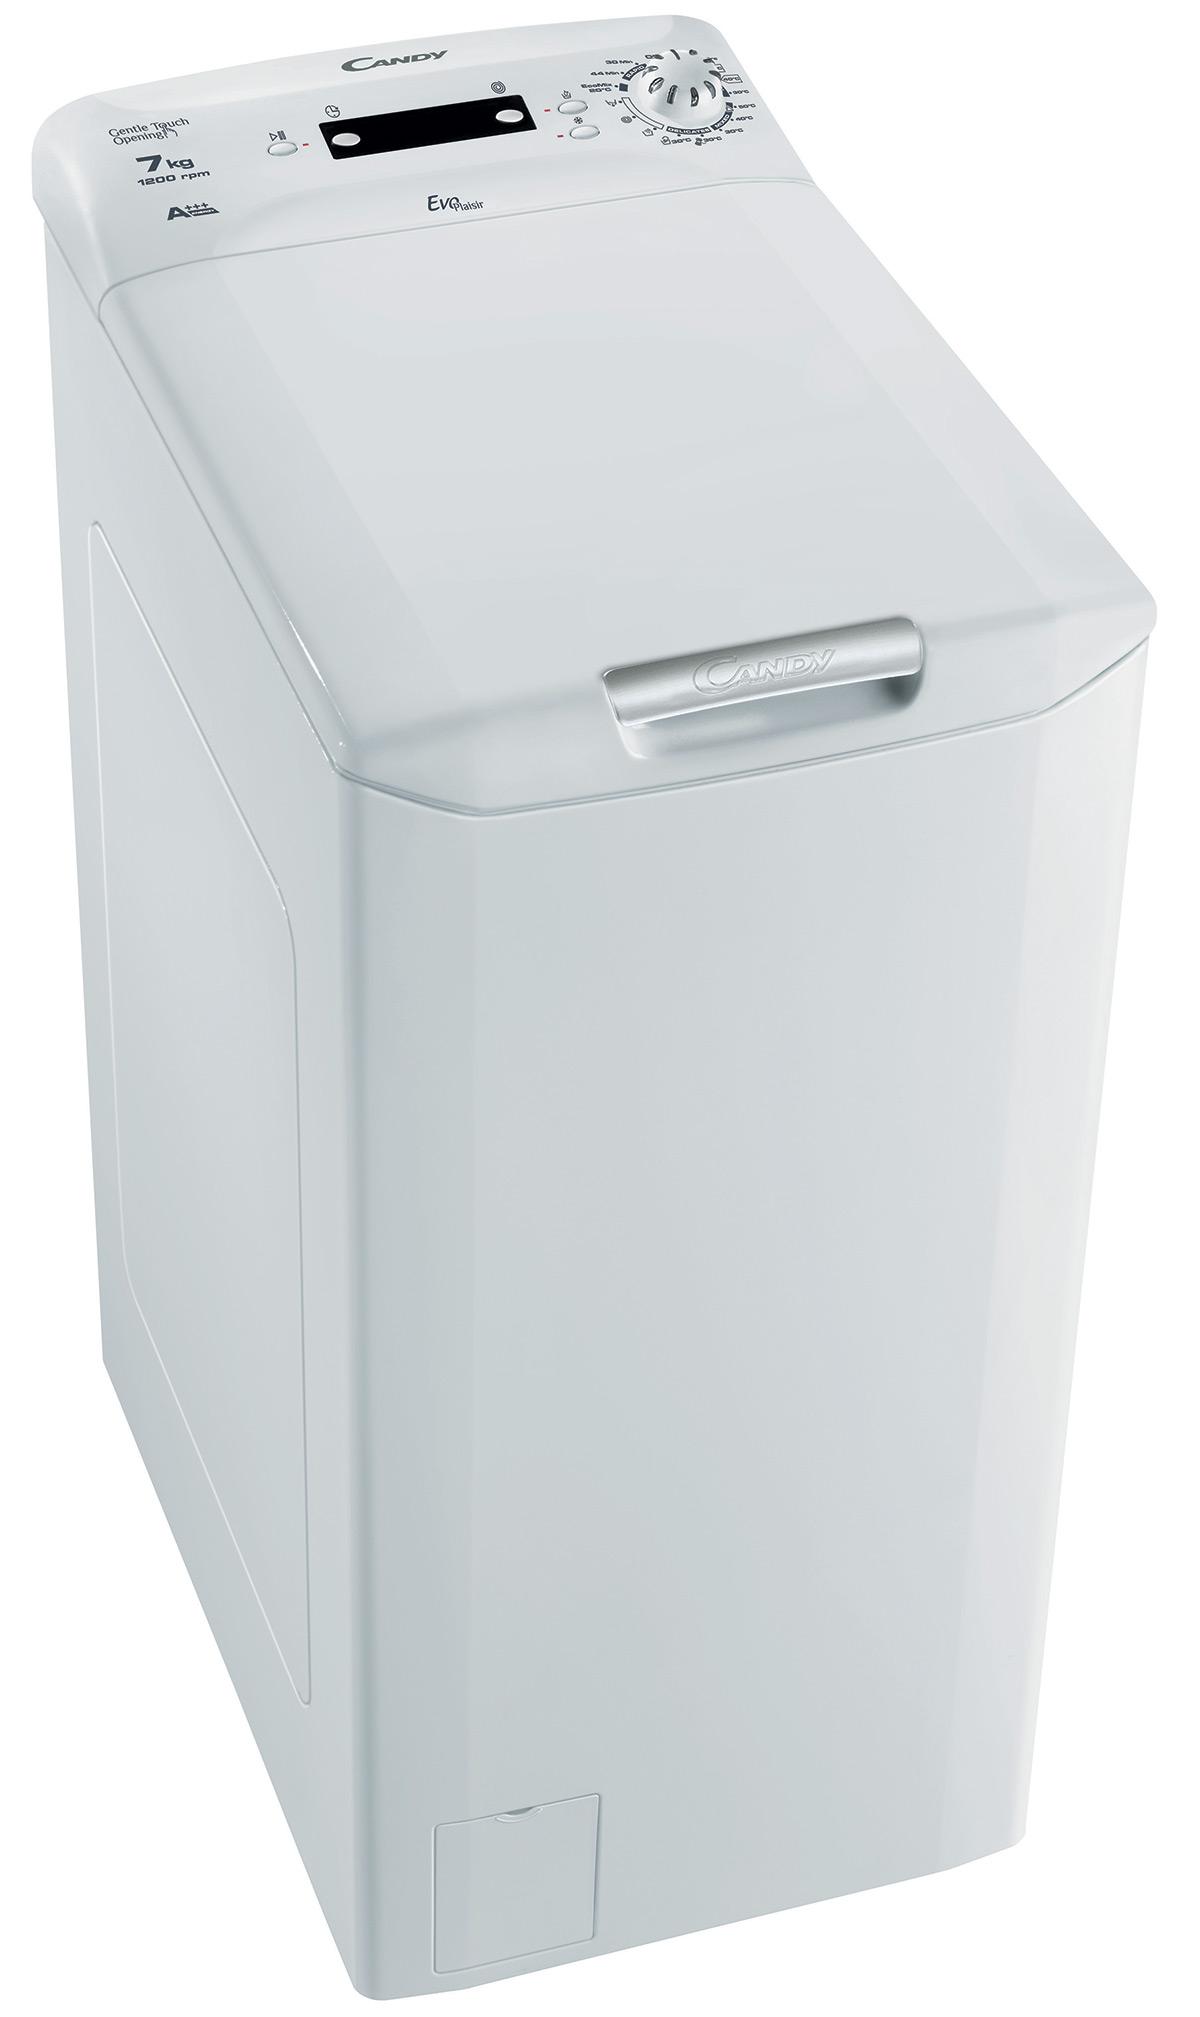 Candy EVOGTH12072D3-S - Πλυντήριο Ρούχων Άνω Φόρτωσης - Δωρεάν ... b5c35149506